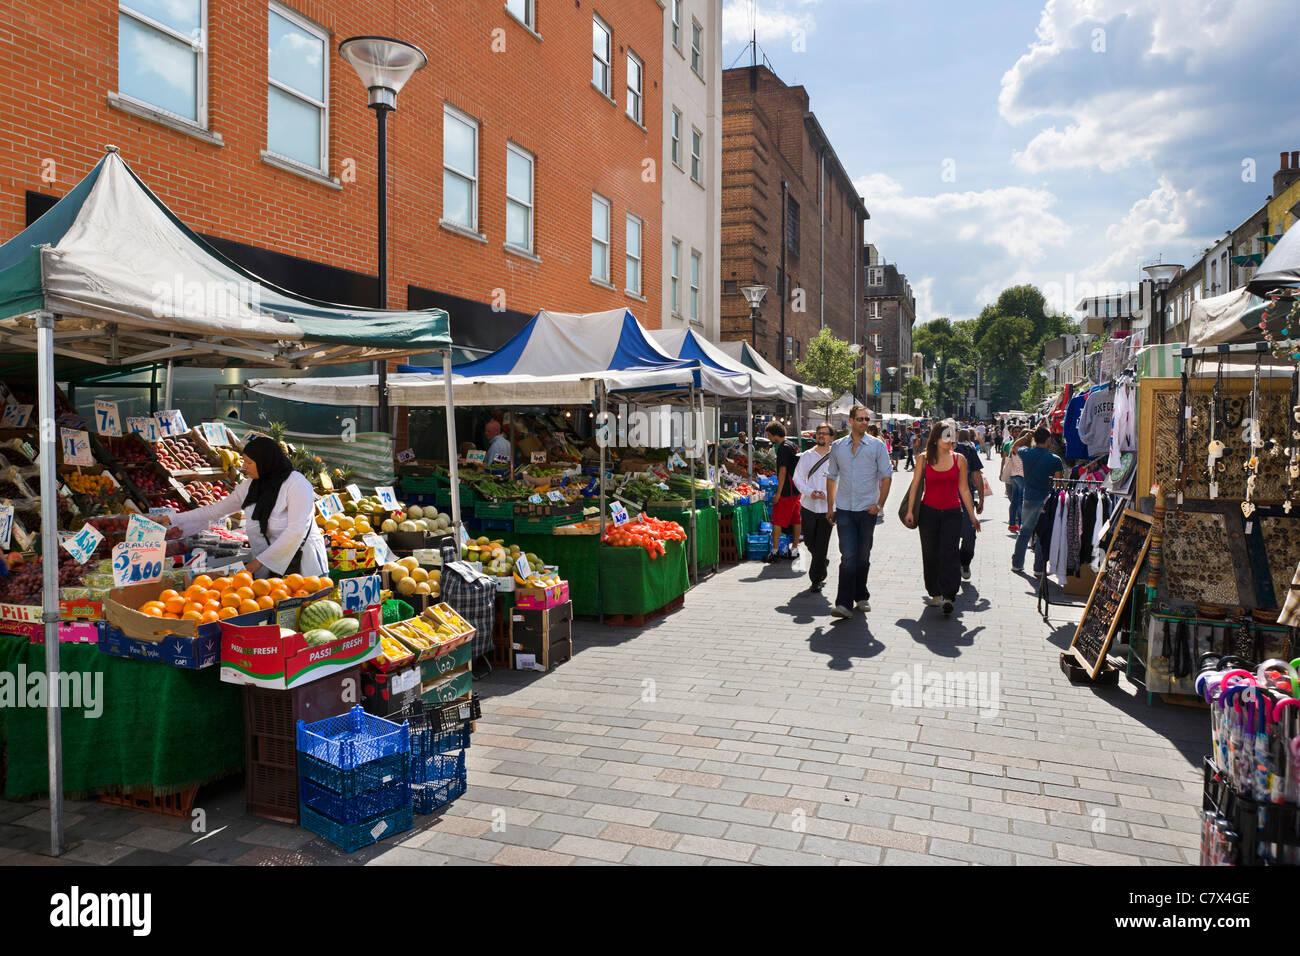 Cale à Inverness Street Market, Camden Town, au nord de Londres, Angleterre, RU Photo Stock